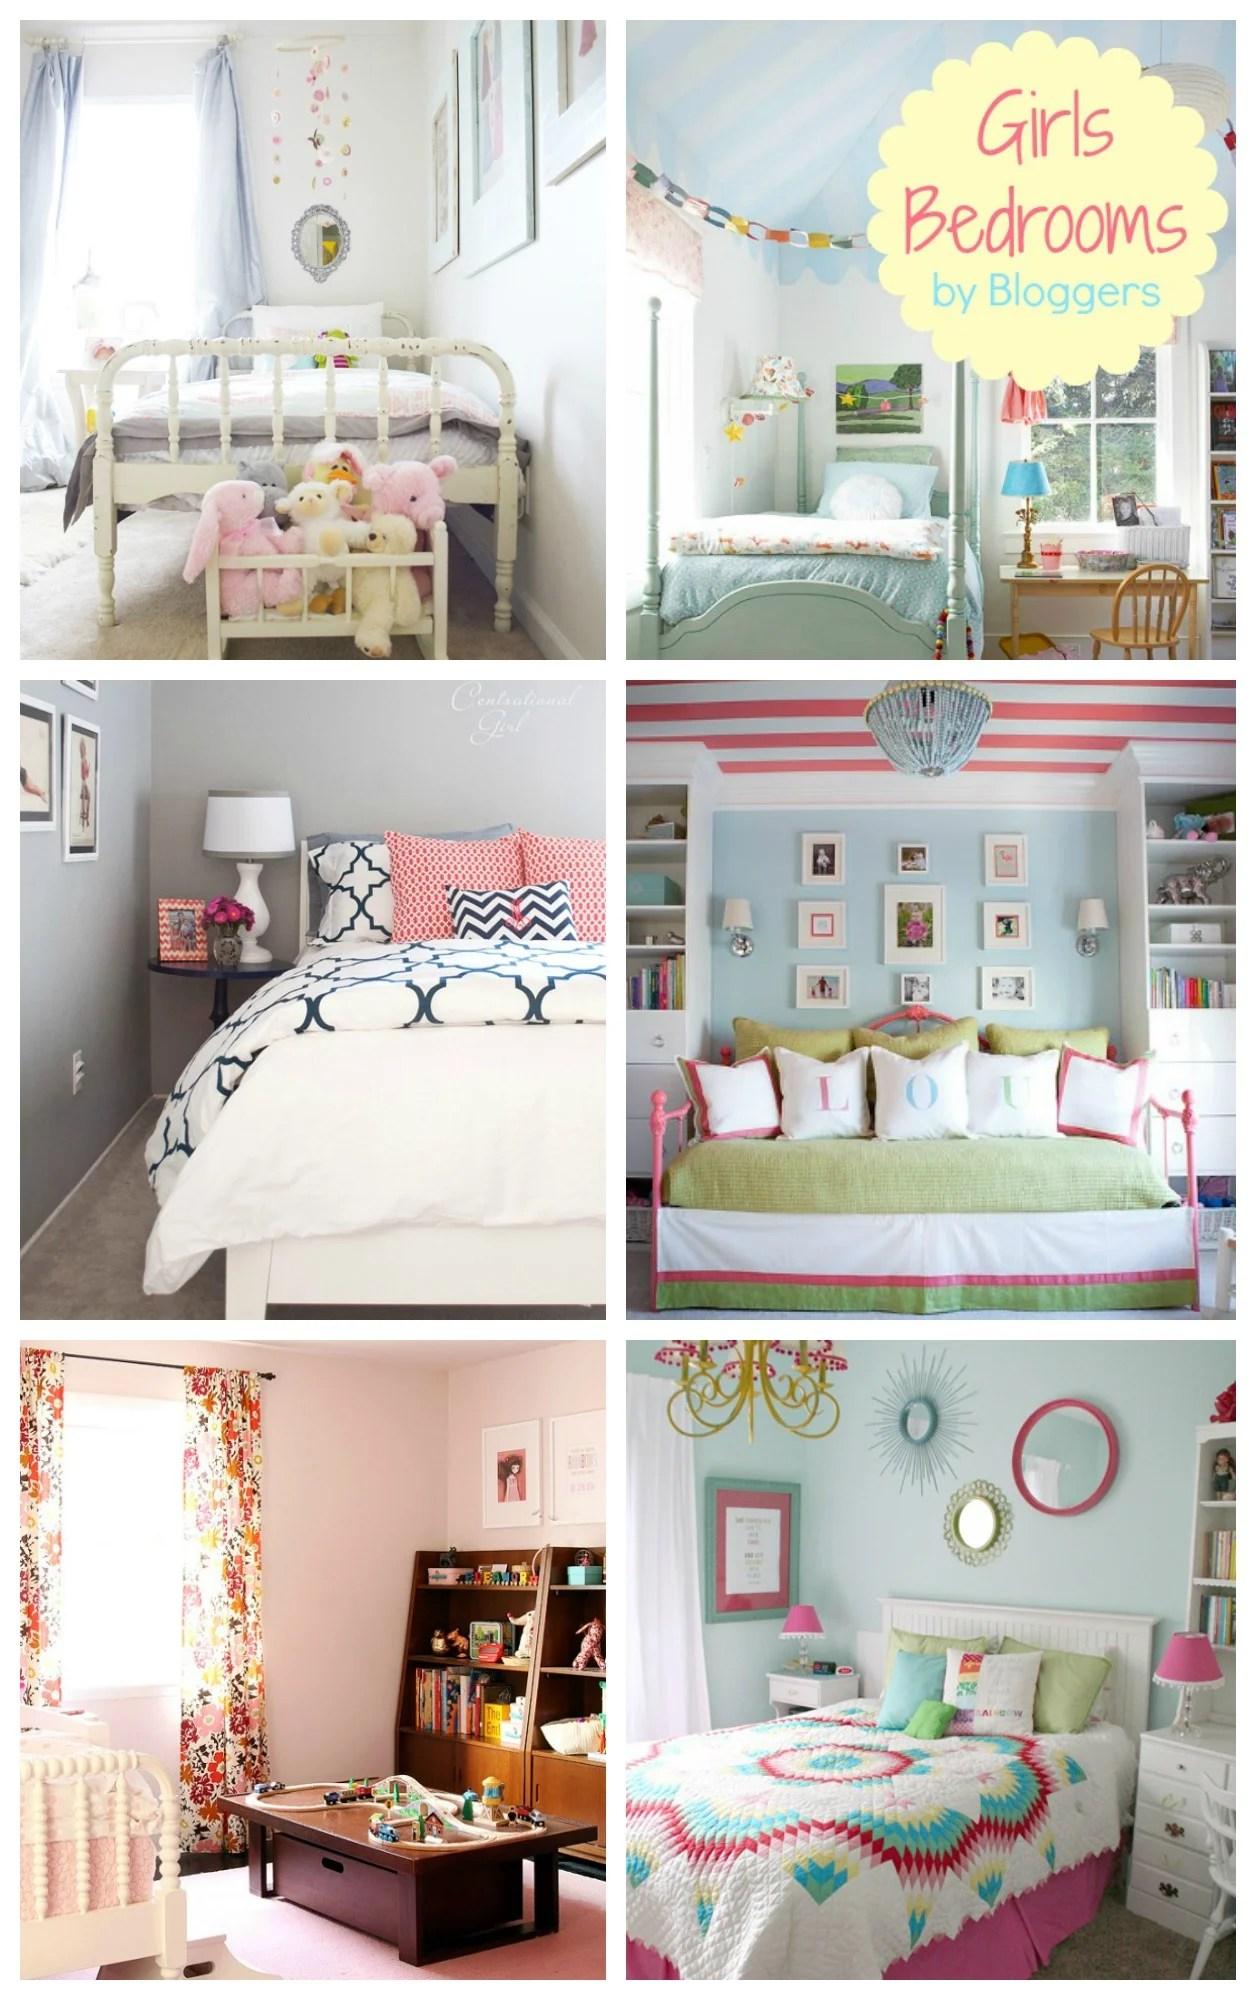 Great Girl Bedroom Ideas For Real Life Kids! #bedroom #design #girls